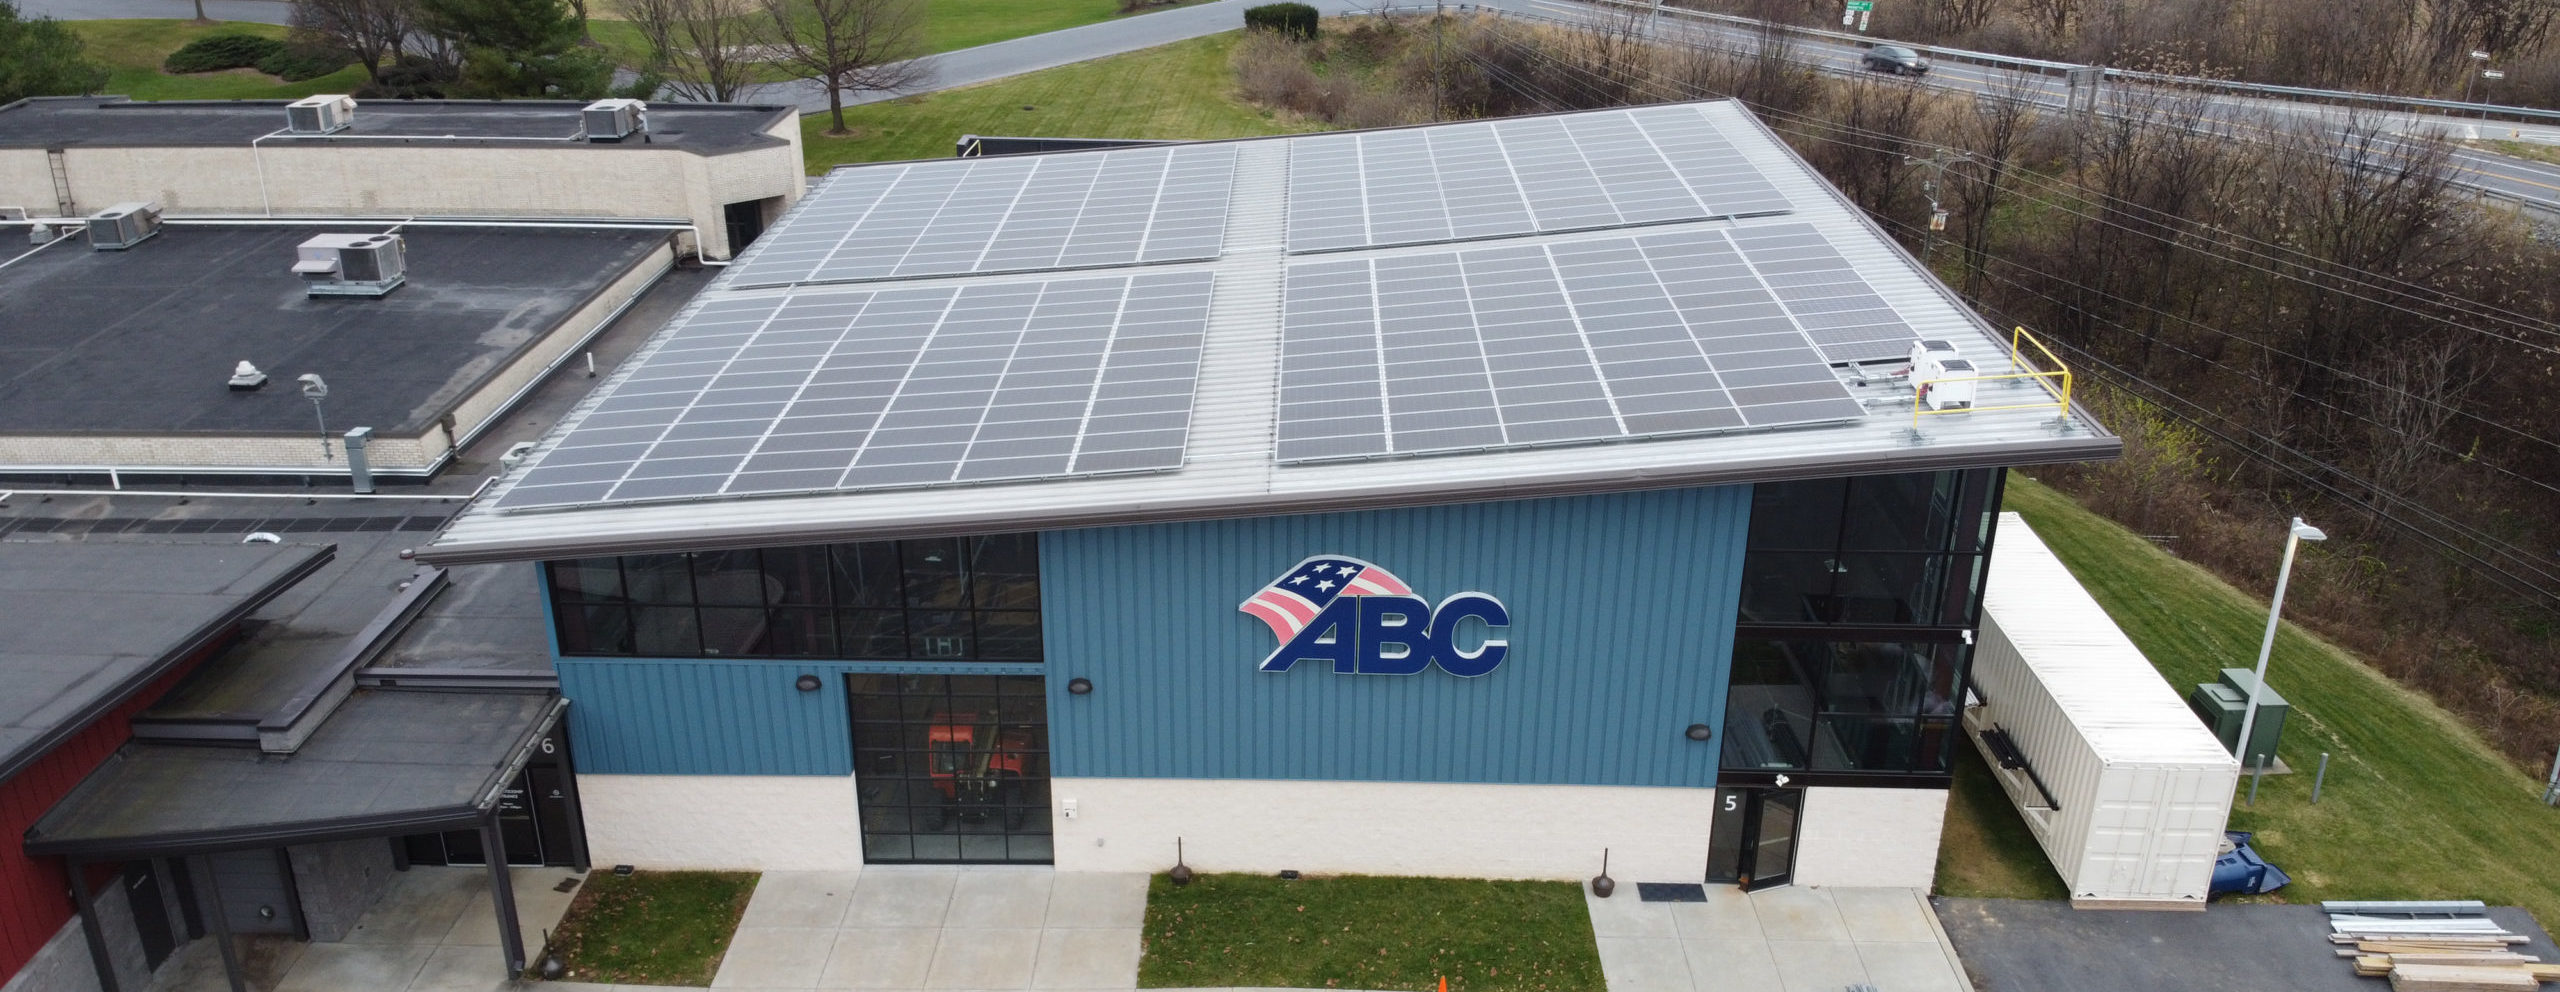 ABC Keystone Installs Solar Array